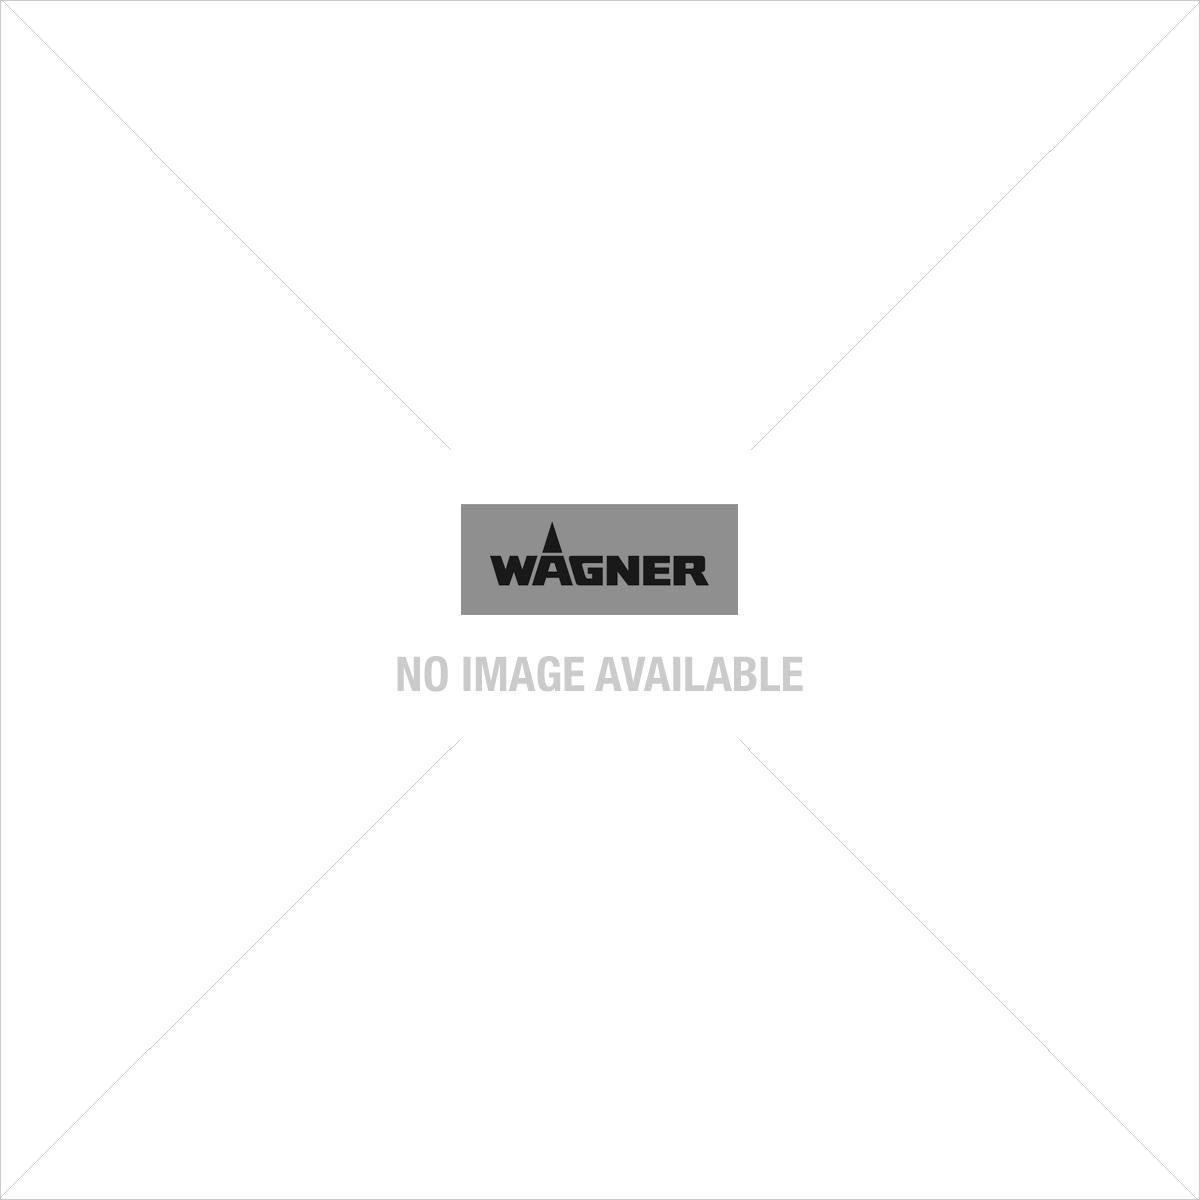 Wagner W450 SE Airless - Traitement du Bois